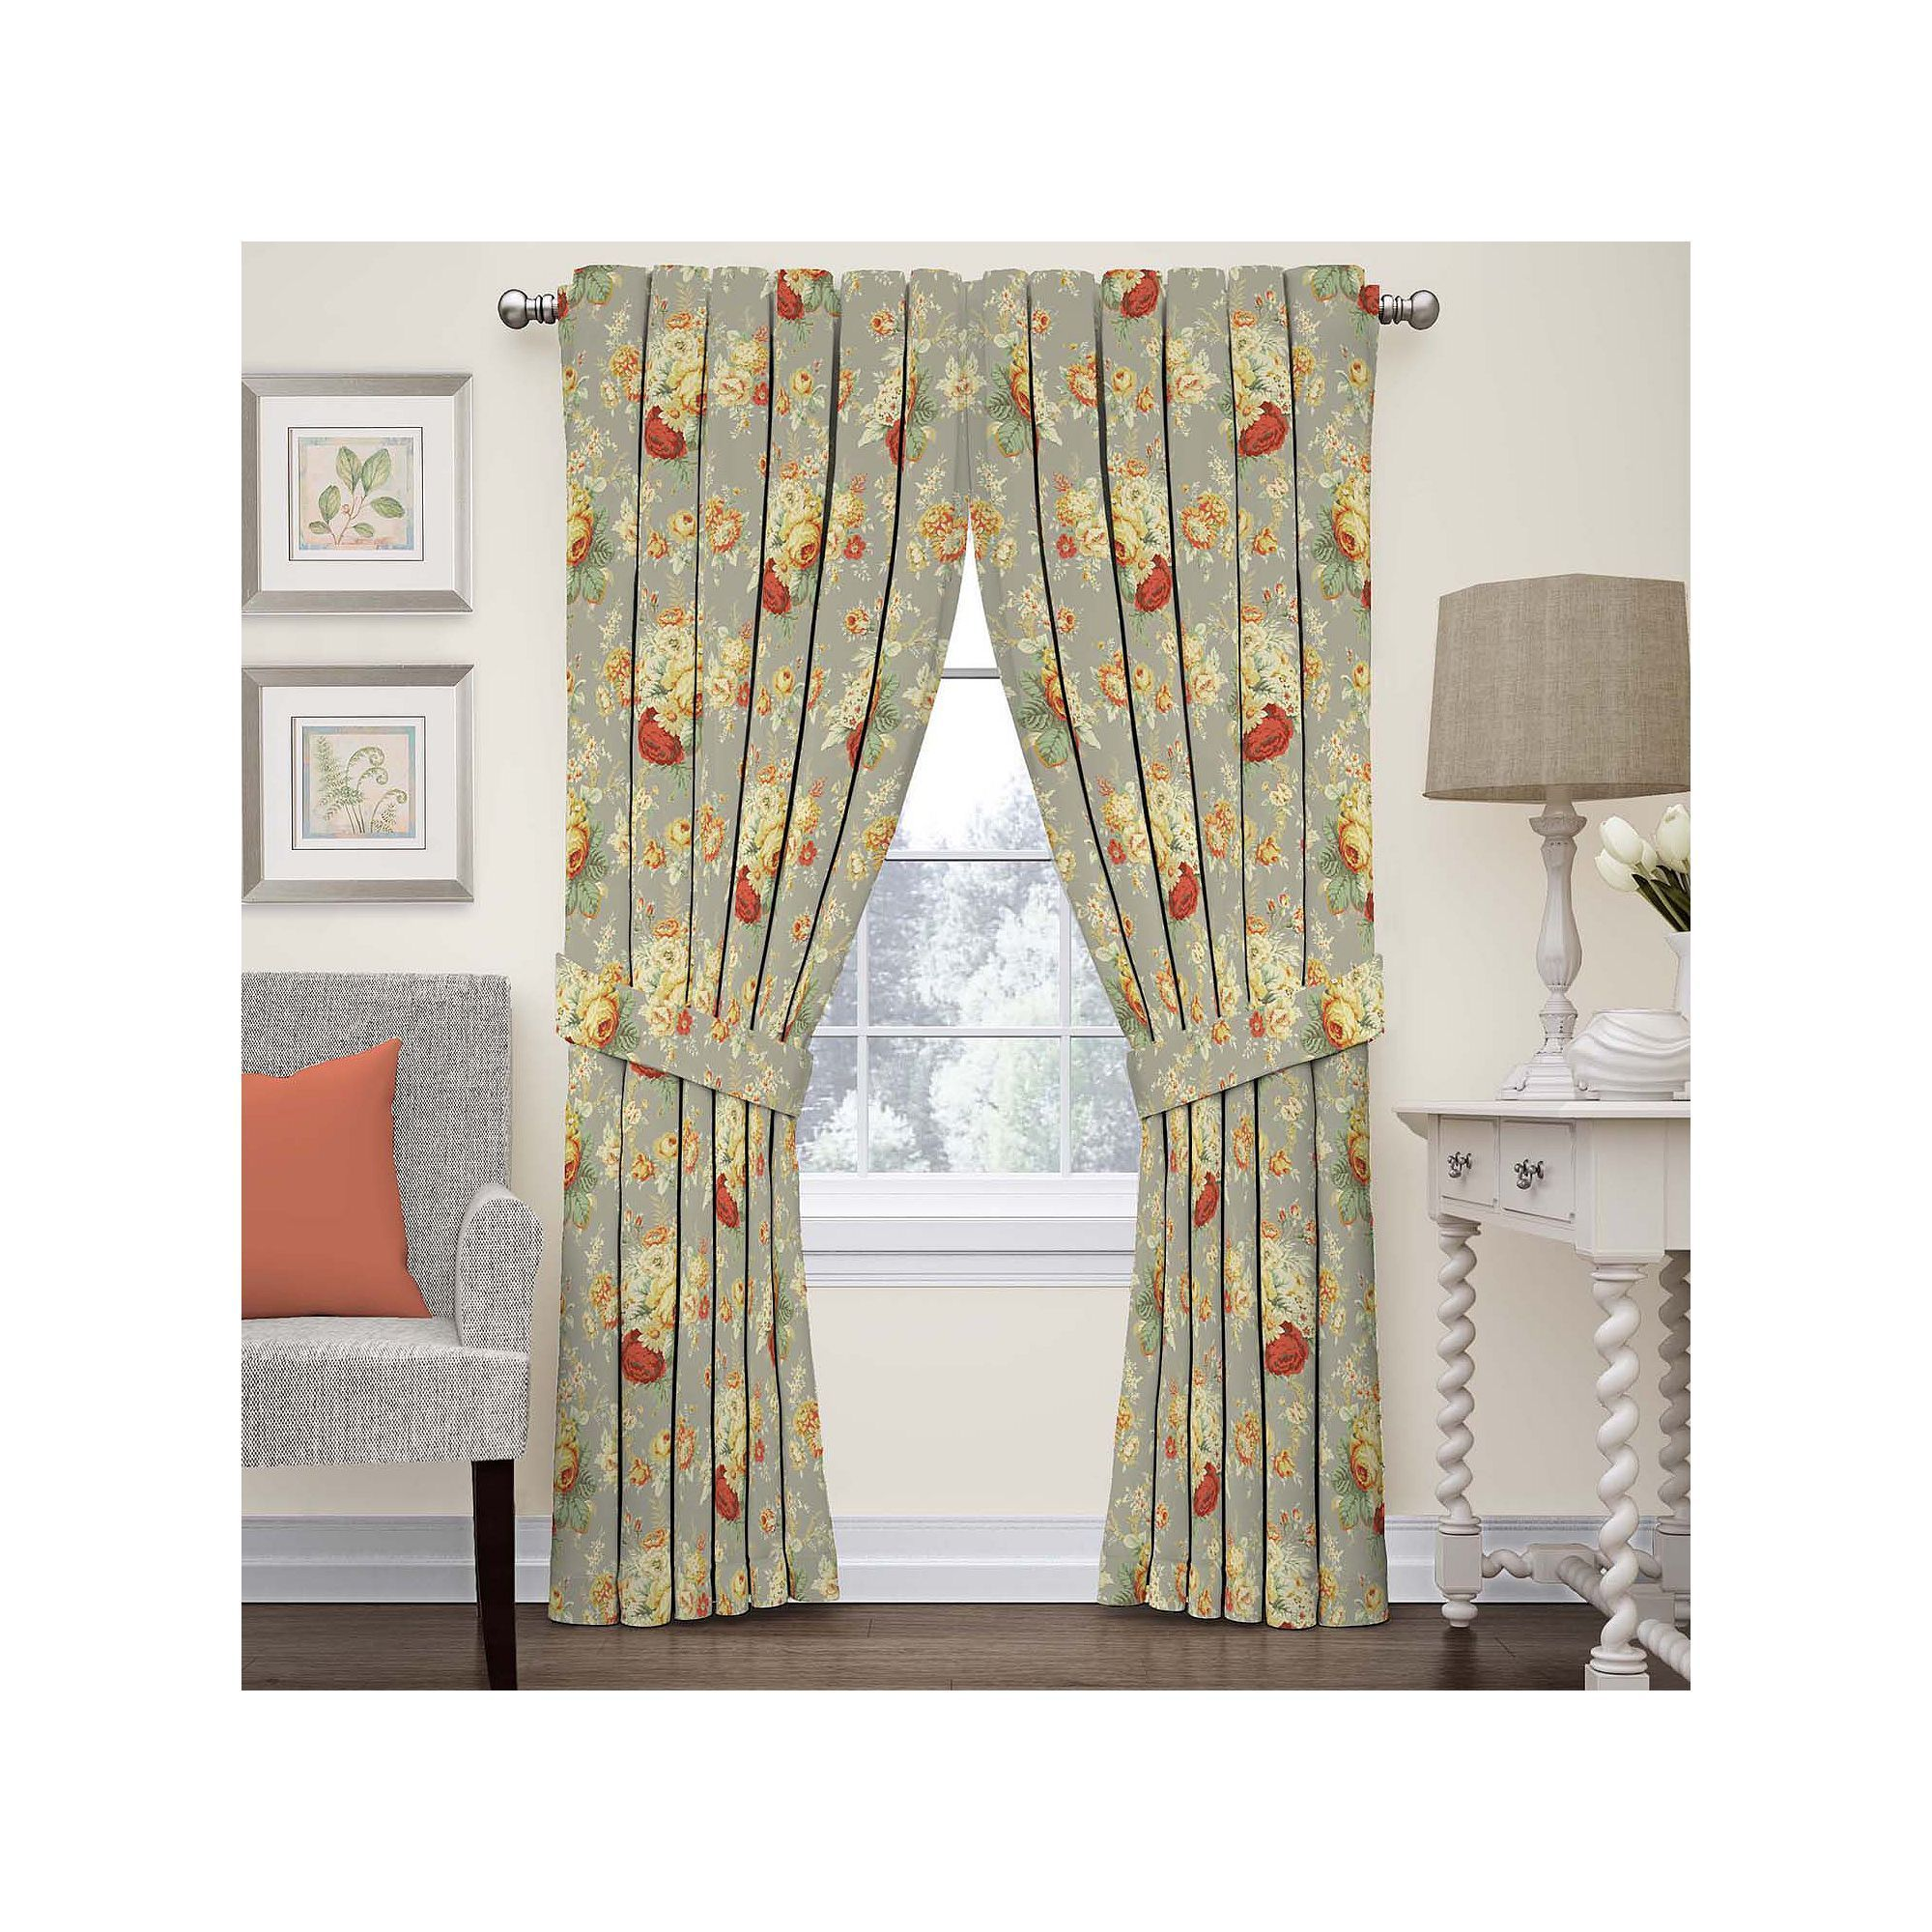 Cheap and easy cool ideas burlap curtains nursery beige curtains